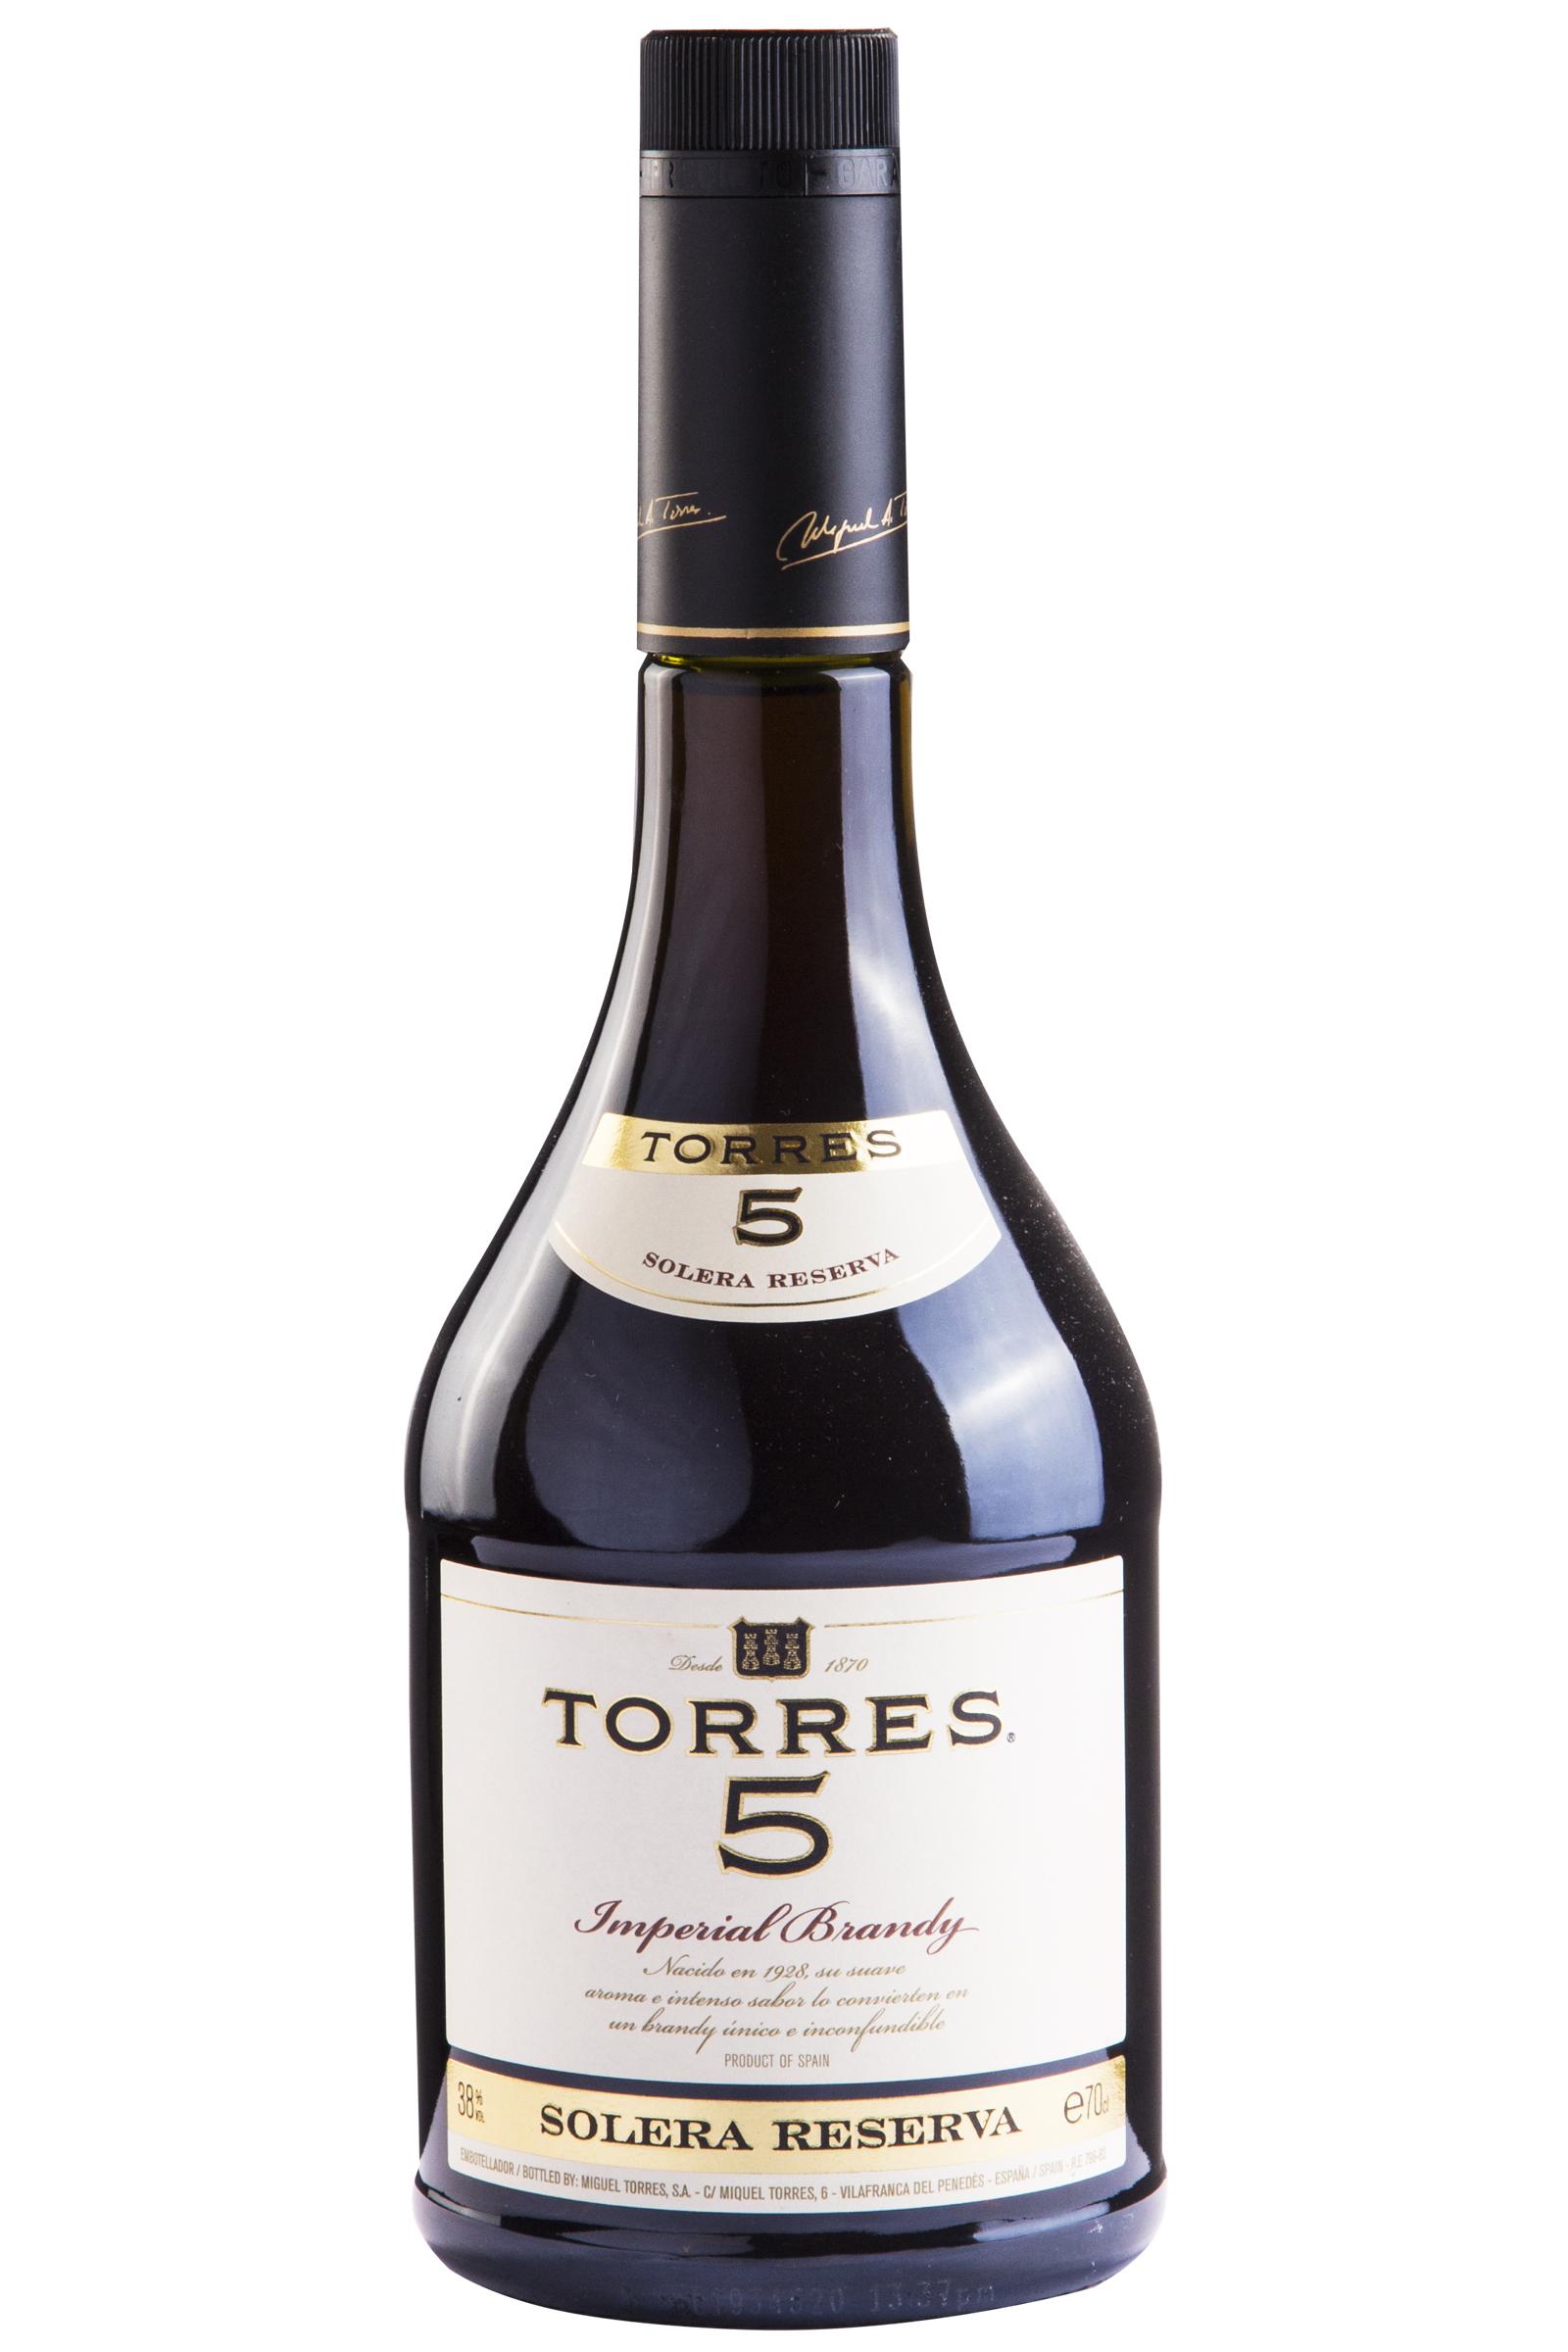 Brandy Torres 5 700ml